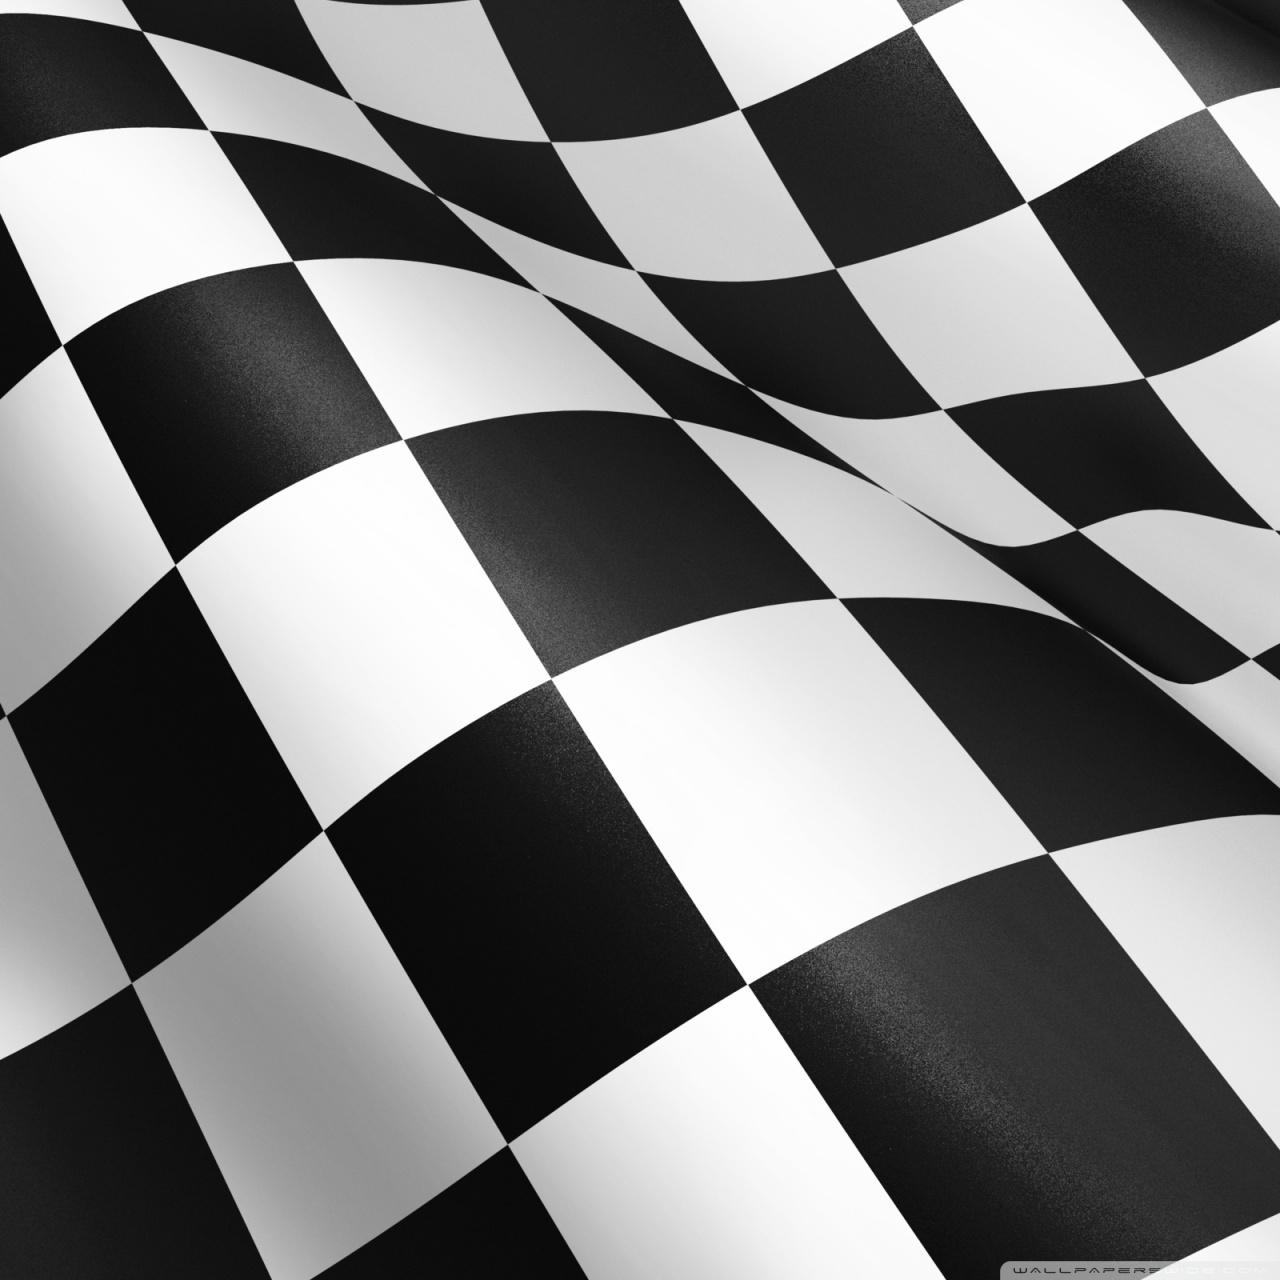 Racing Flag 4K HD Desktop Wallpaper for 4K Ultra HD TV Dual 1280x1280